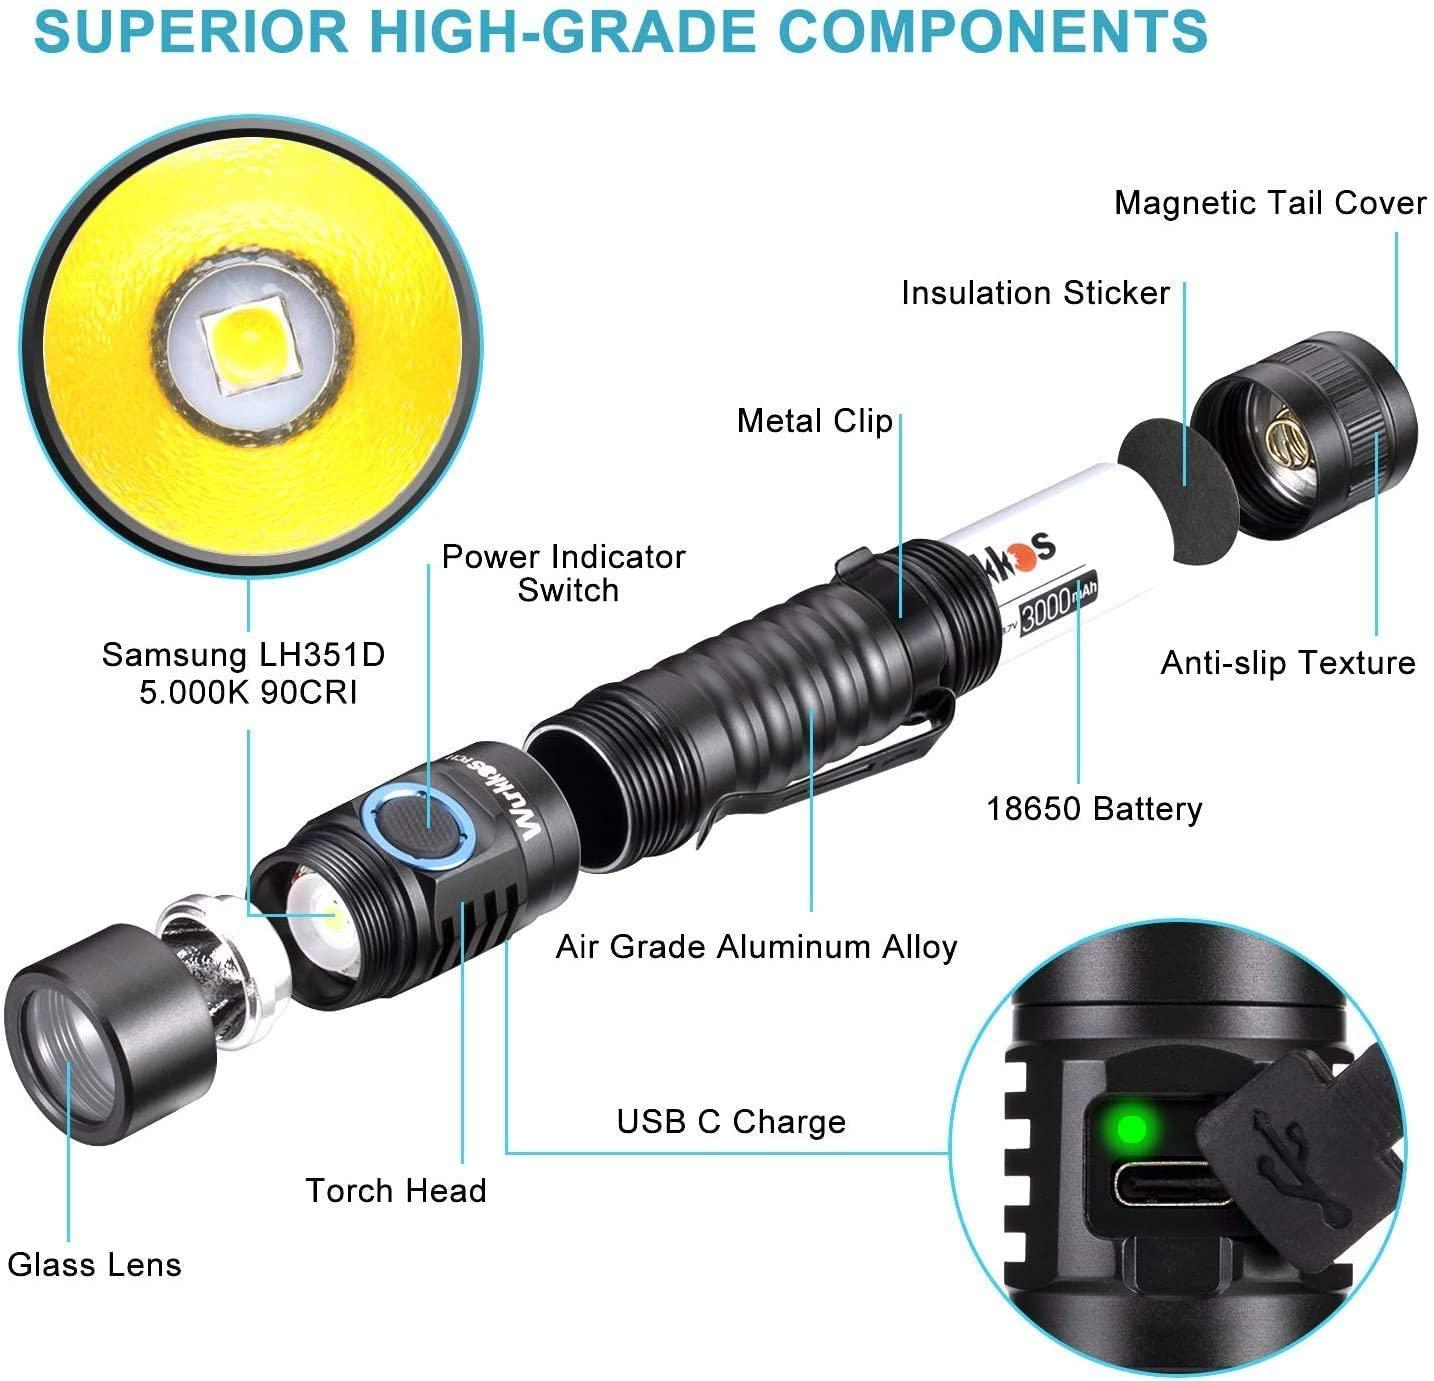 Wurkkos_FC11_EDC_Flashlight_Review_Aluminium_18650_maxgearedc.com_EDC_GEAR_OUTDOOR_TESTING_and_SHORT_REVIEWS_1